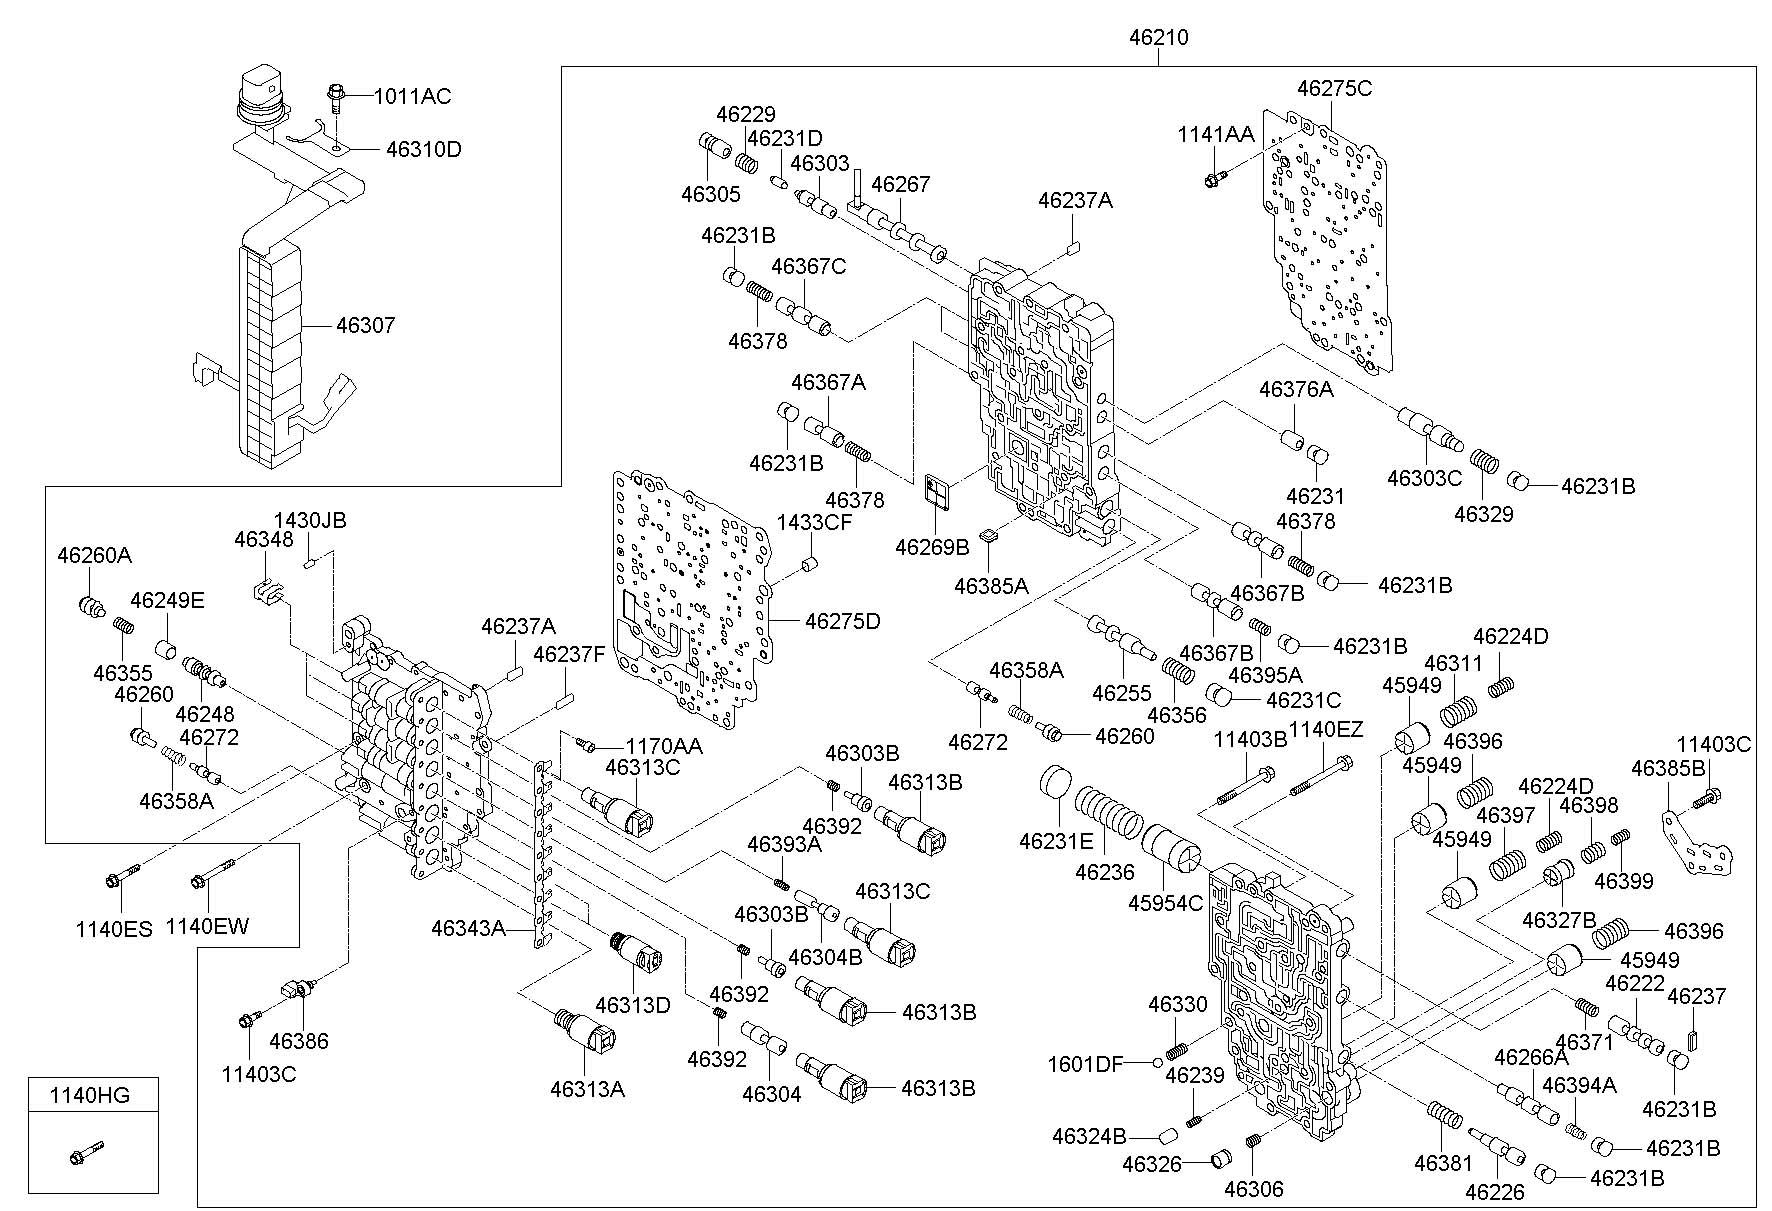 tags: #2005 hyundai elantra exhaust diagram#hyundai tucson engine diagram#2002  hyundai sonata engine diagram#hyundai santa fe exhaust diagram#2003 hyundai